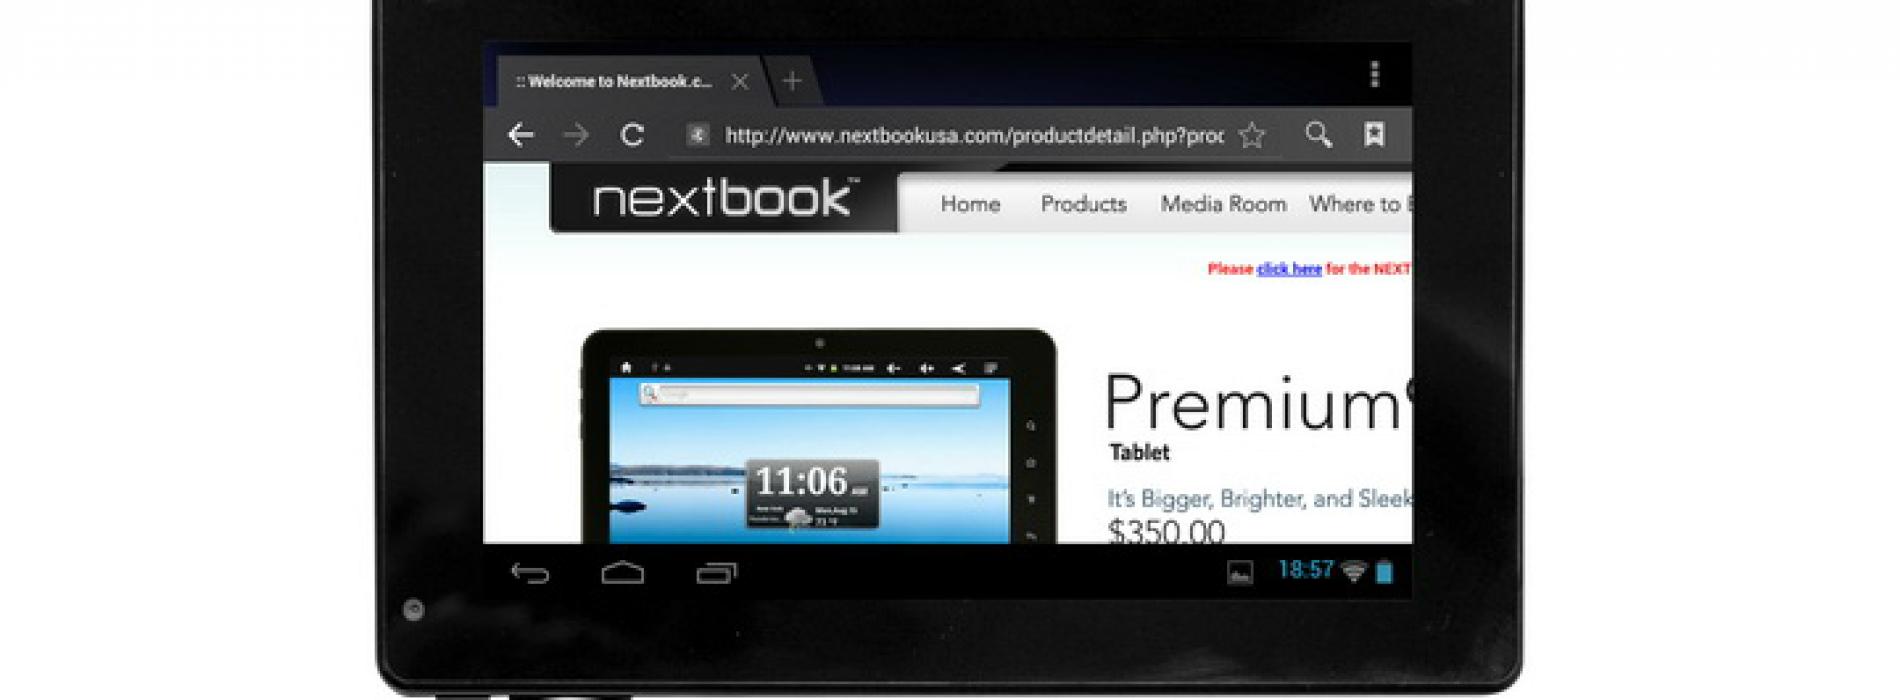 E FUN debuts $129 Nextbook Premium 7SE-GP with Google Play access